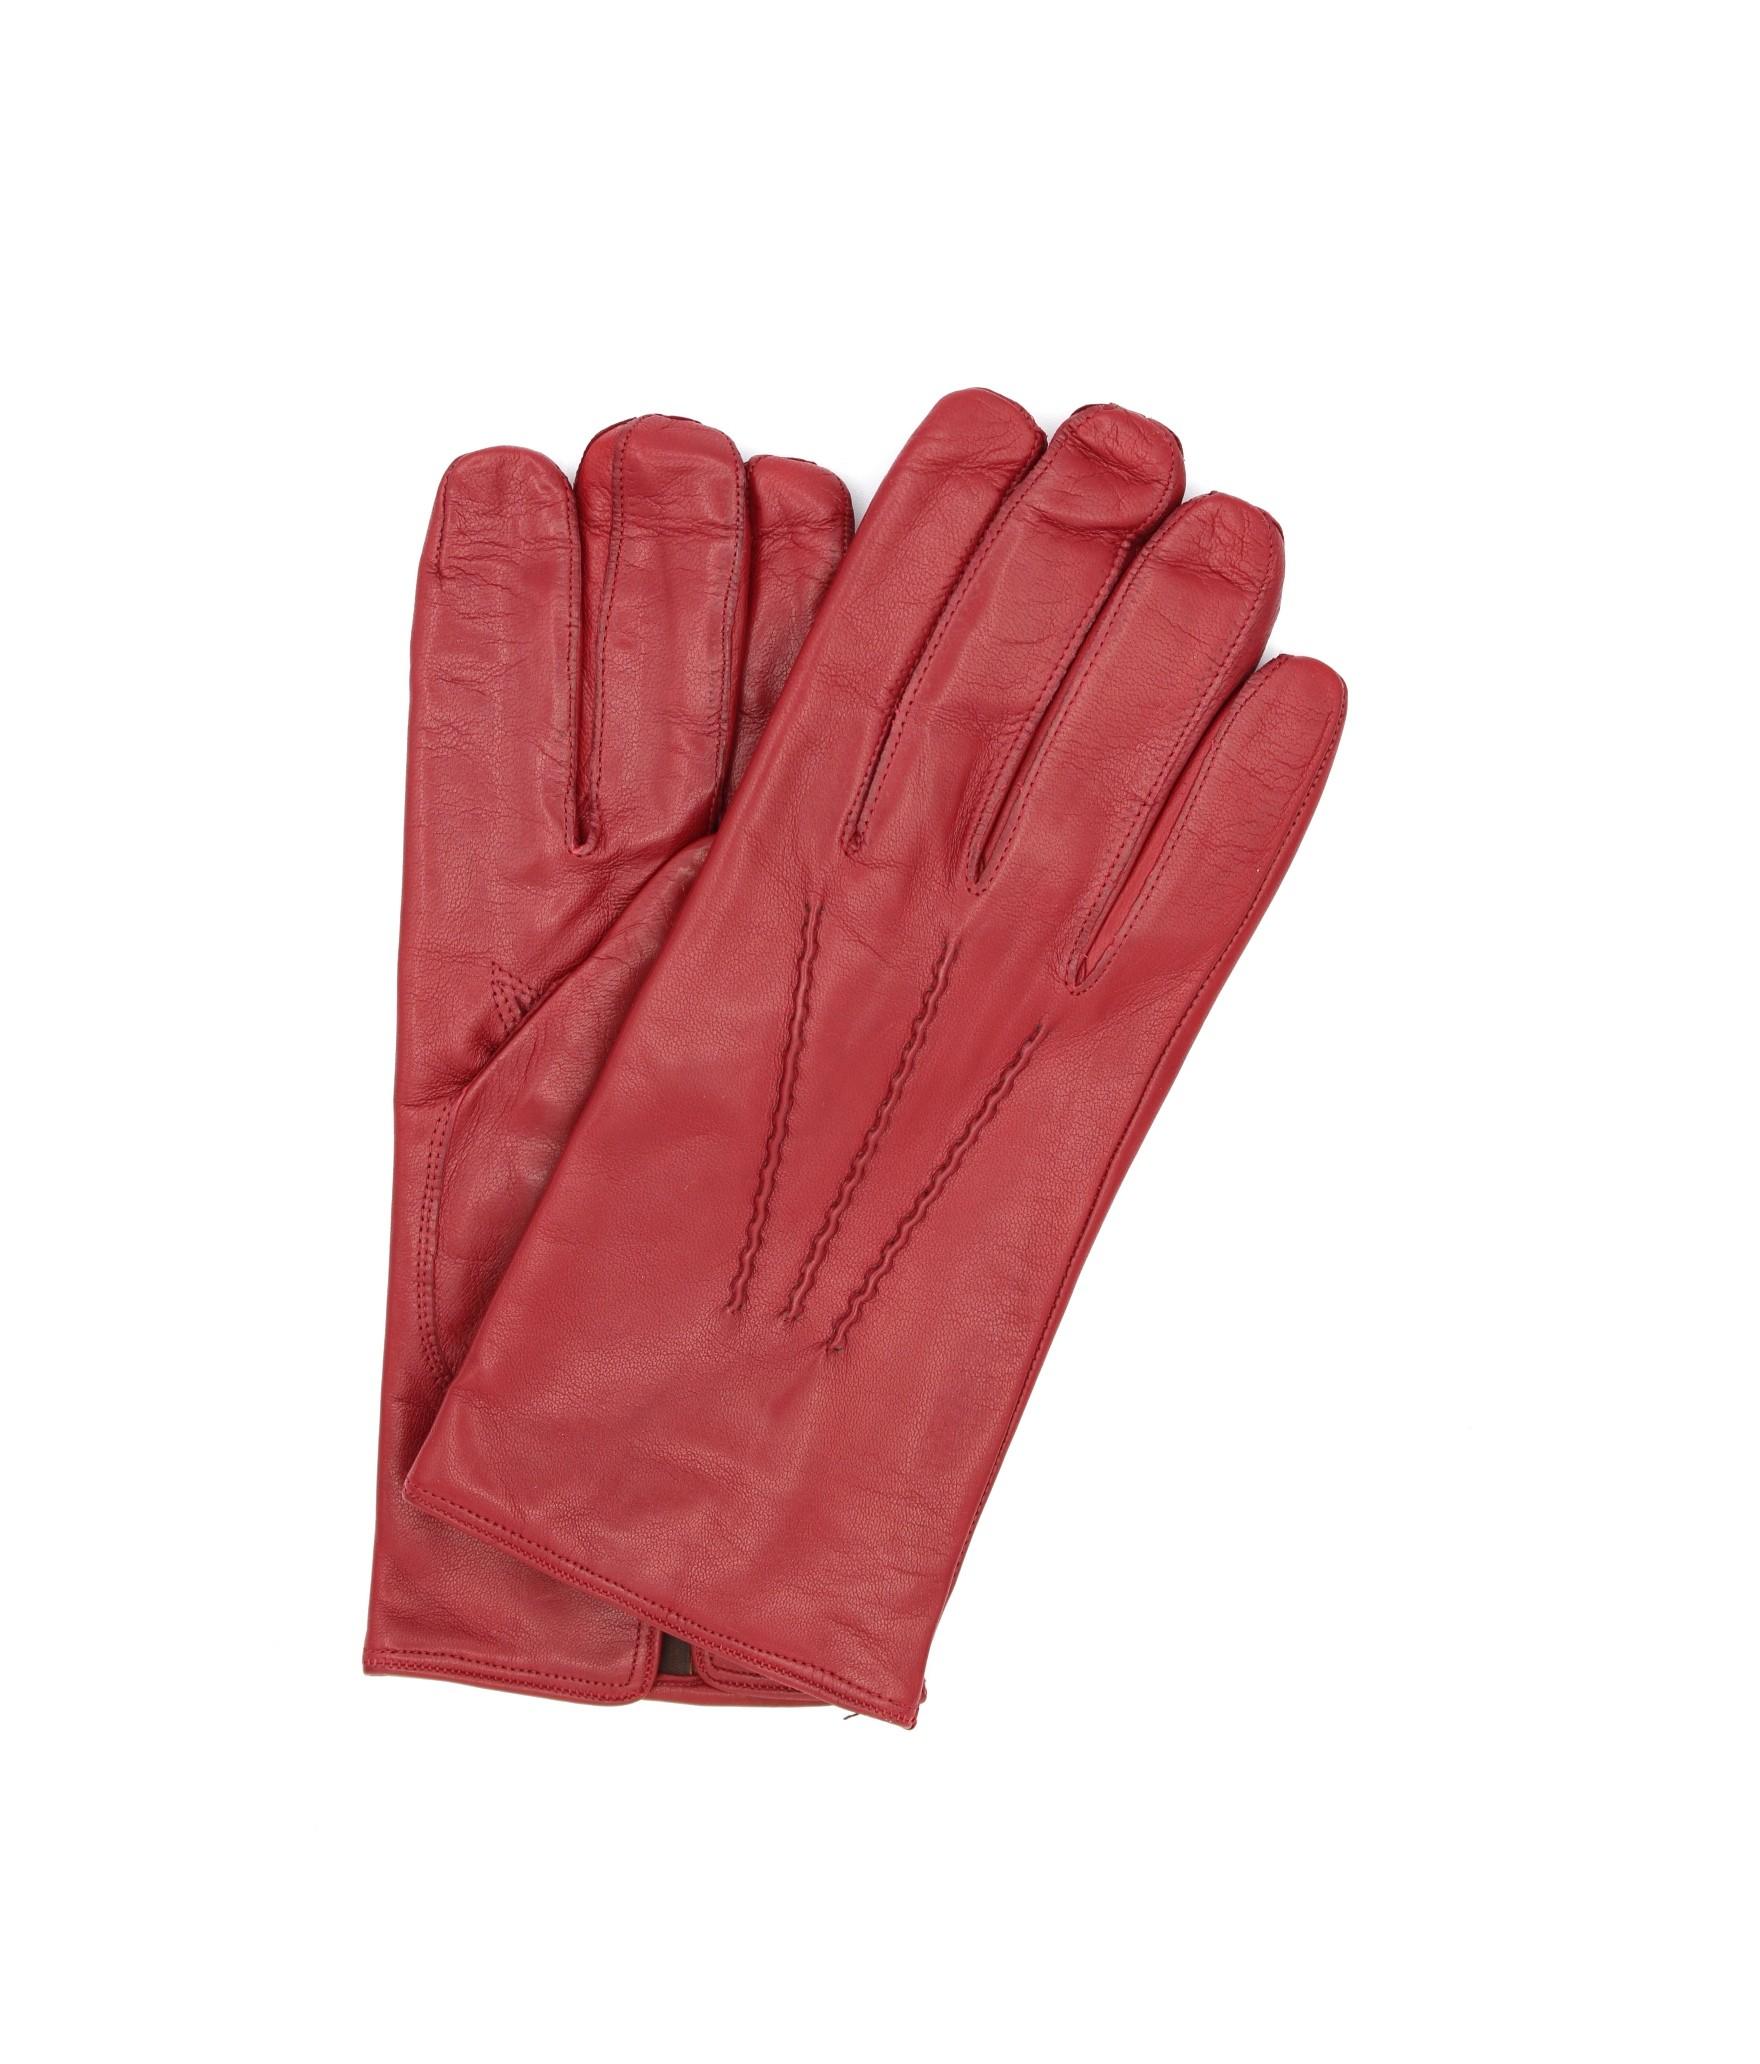 Nappa leather gloves cashmere lined Dark Red Sermoneta Gloves